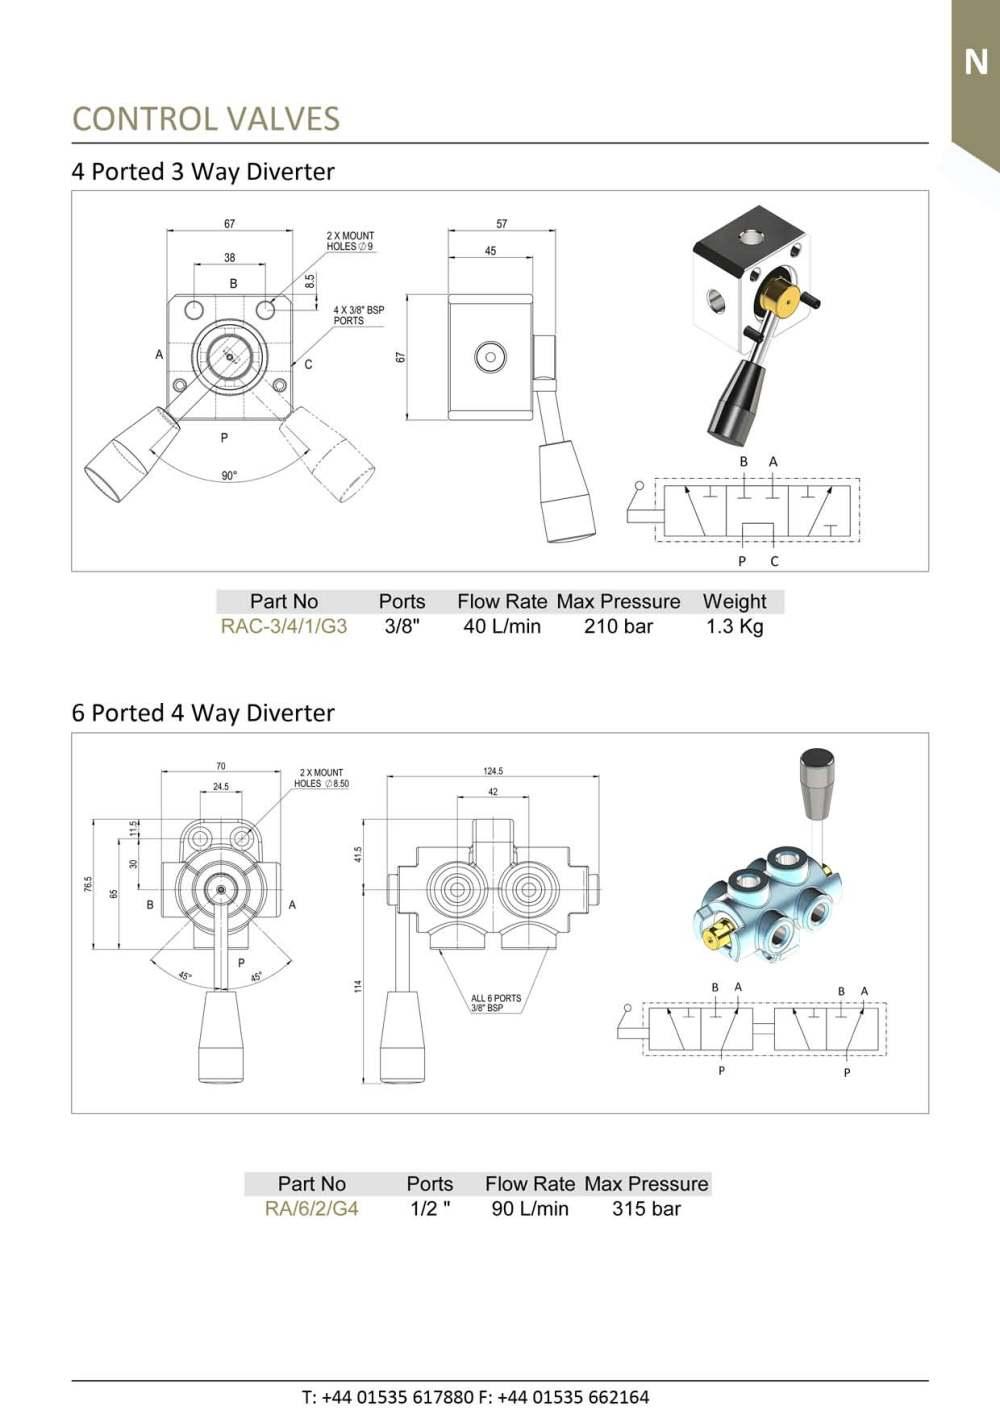 medium resolution of control valves 4 ported 3 way diverter